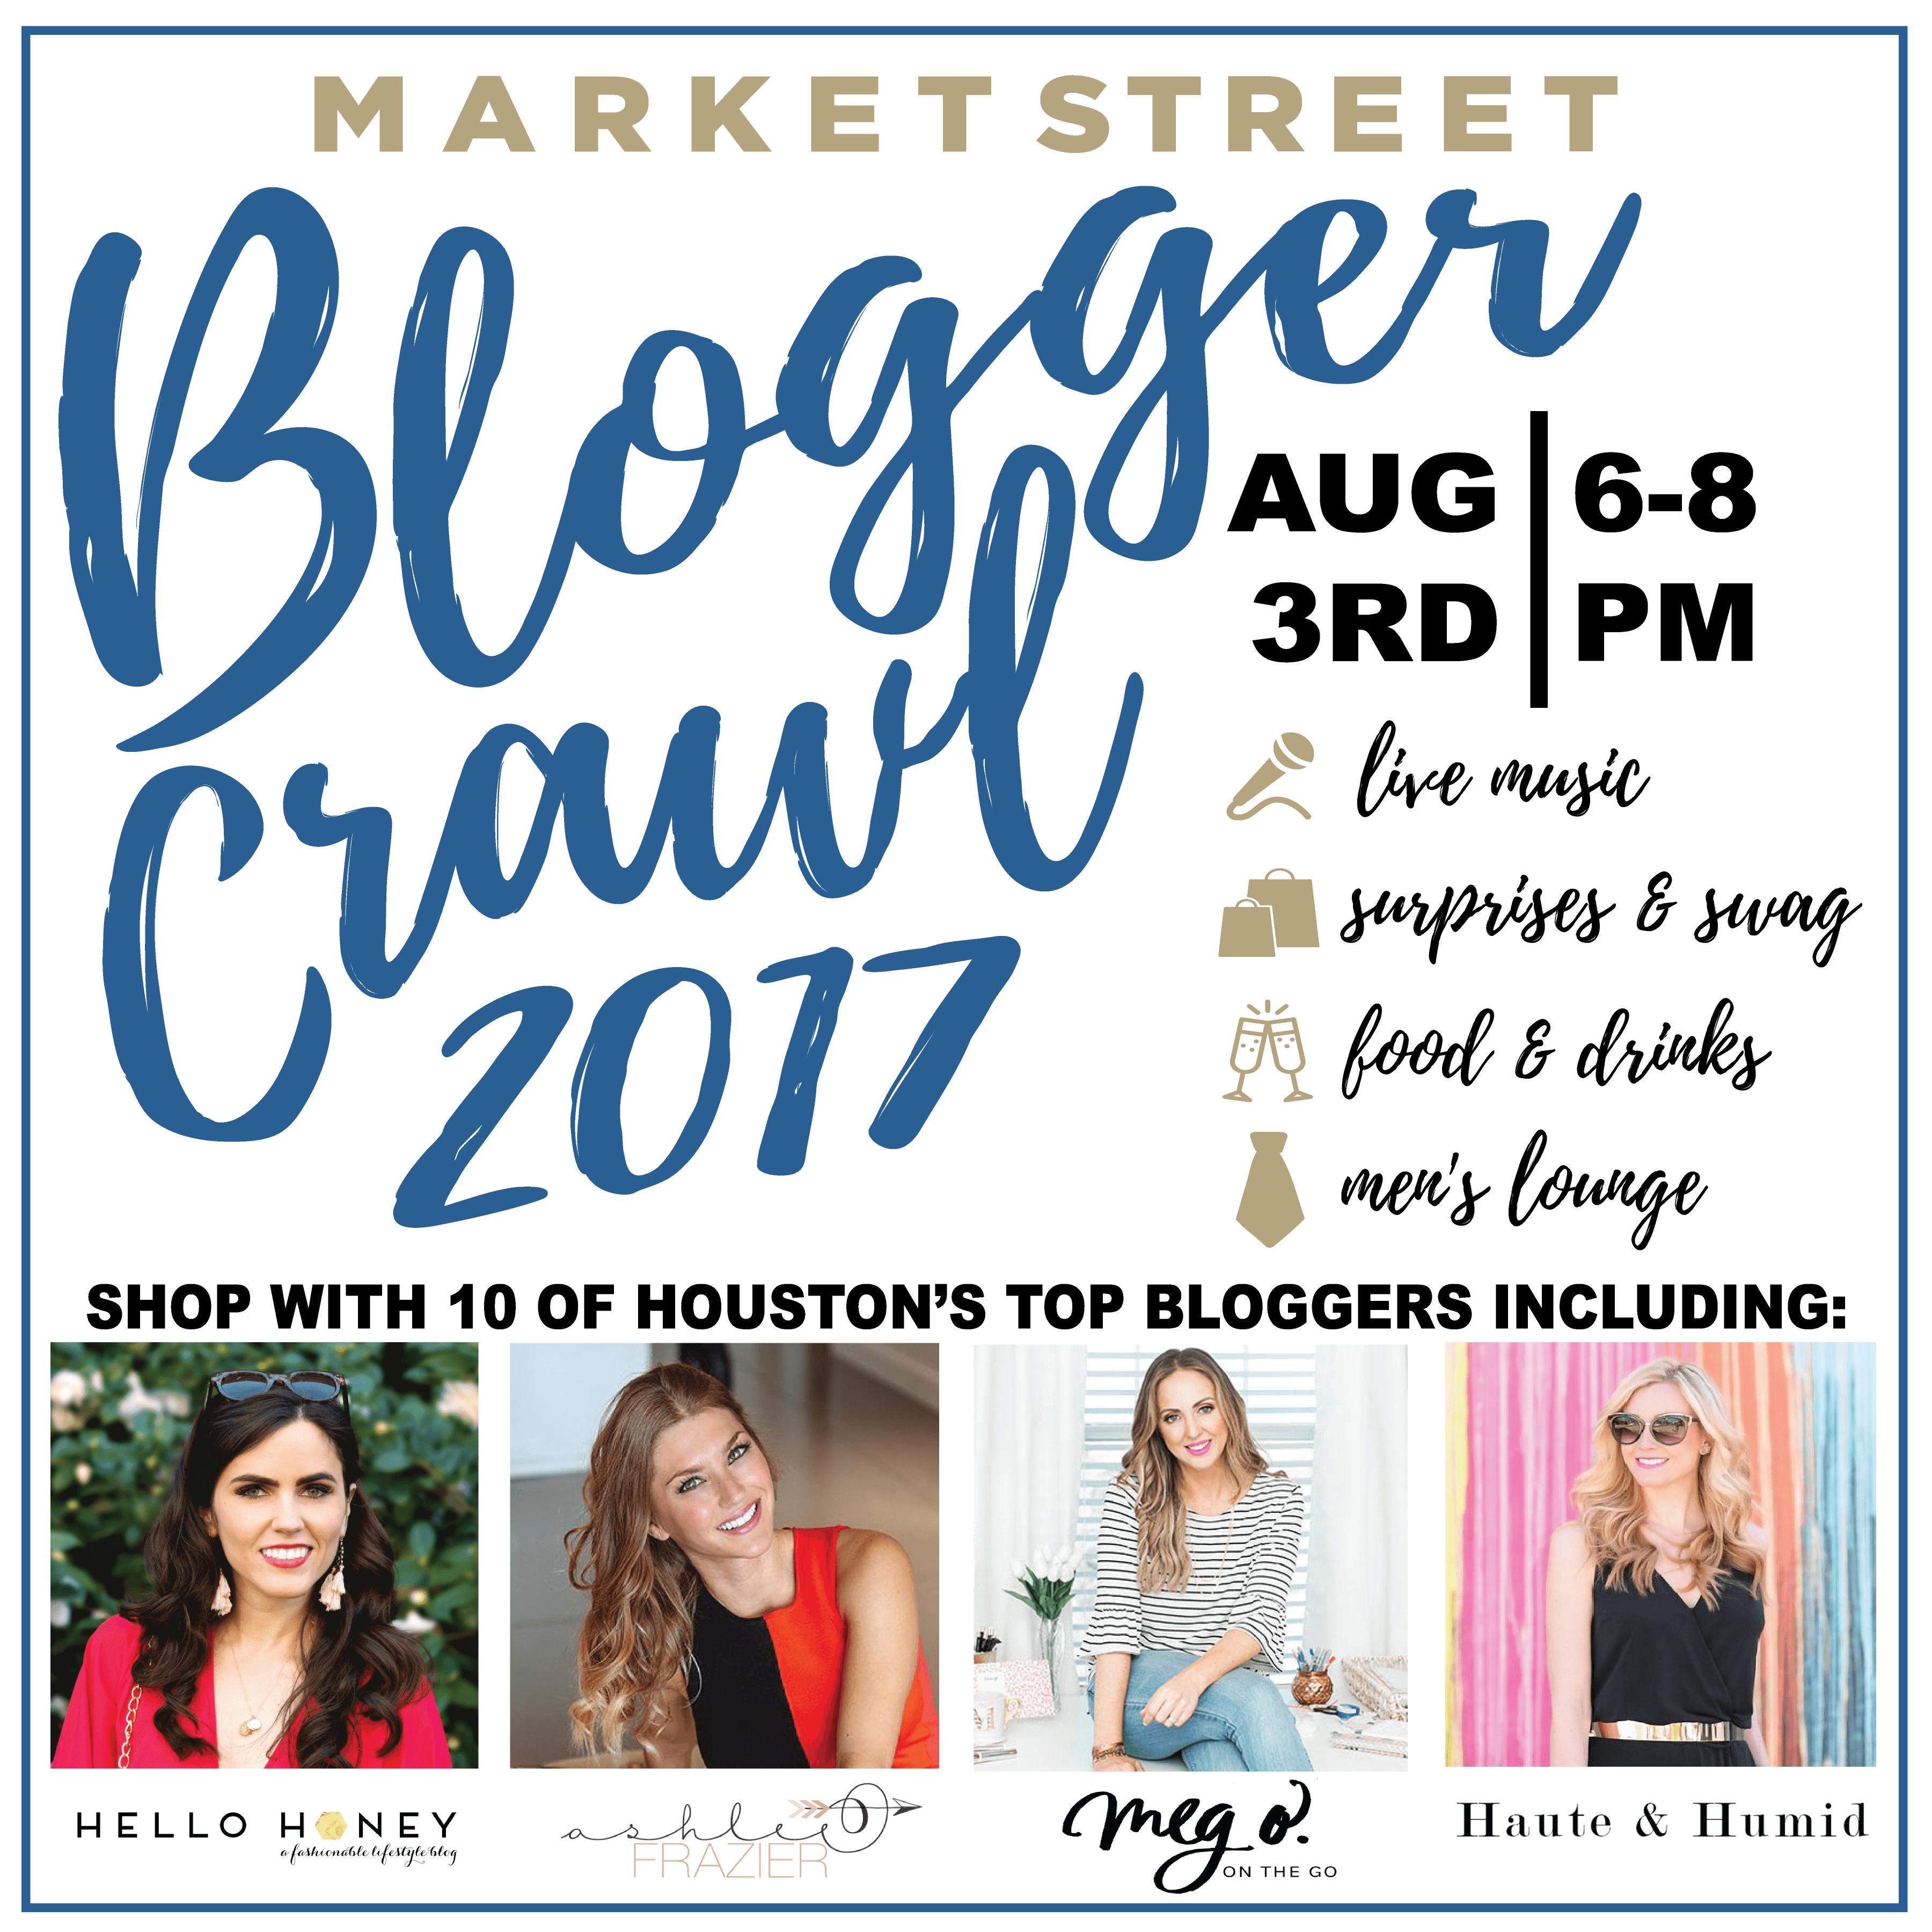 Houston Friends: Join me for the Market Street Blogger Crawl by Houston blogger Meg O. on the Go